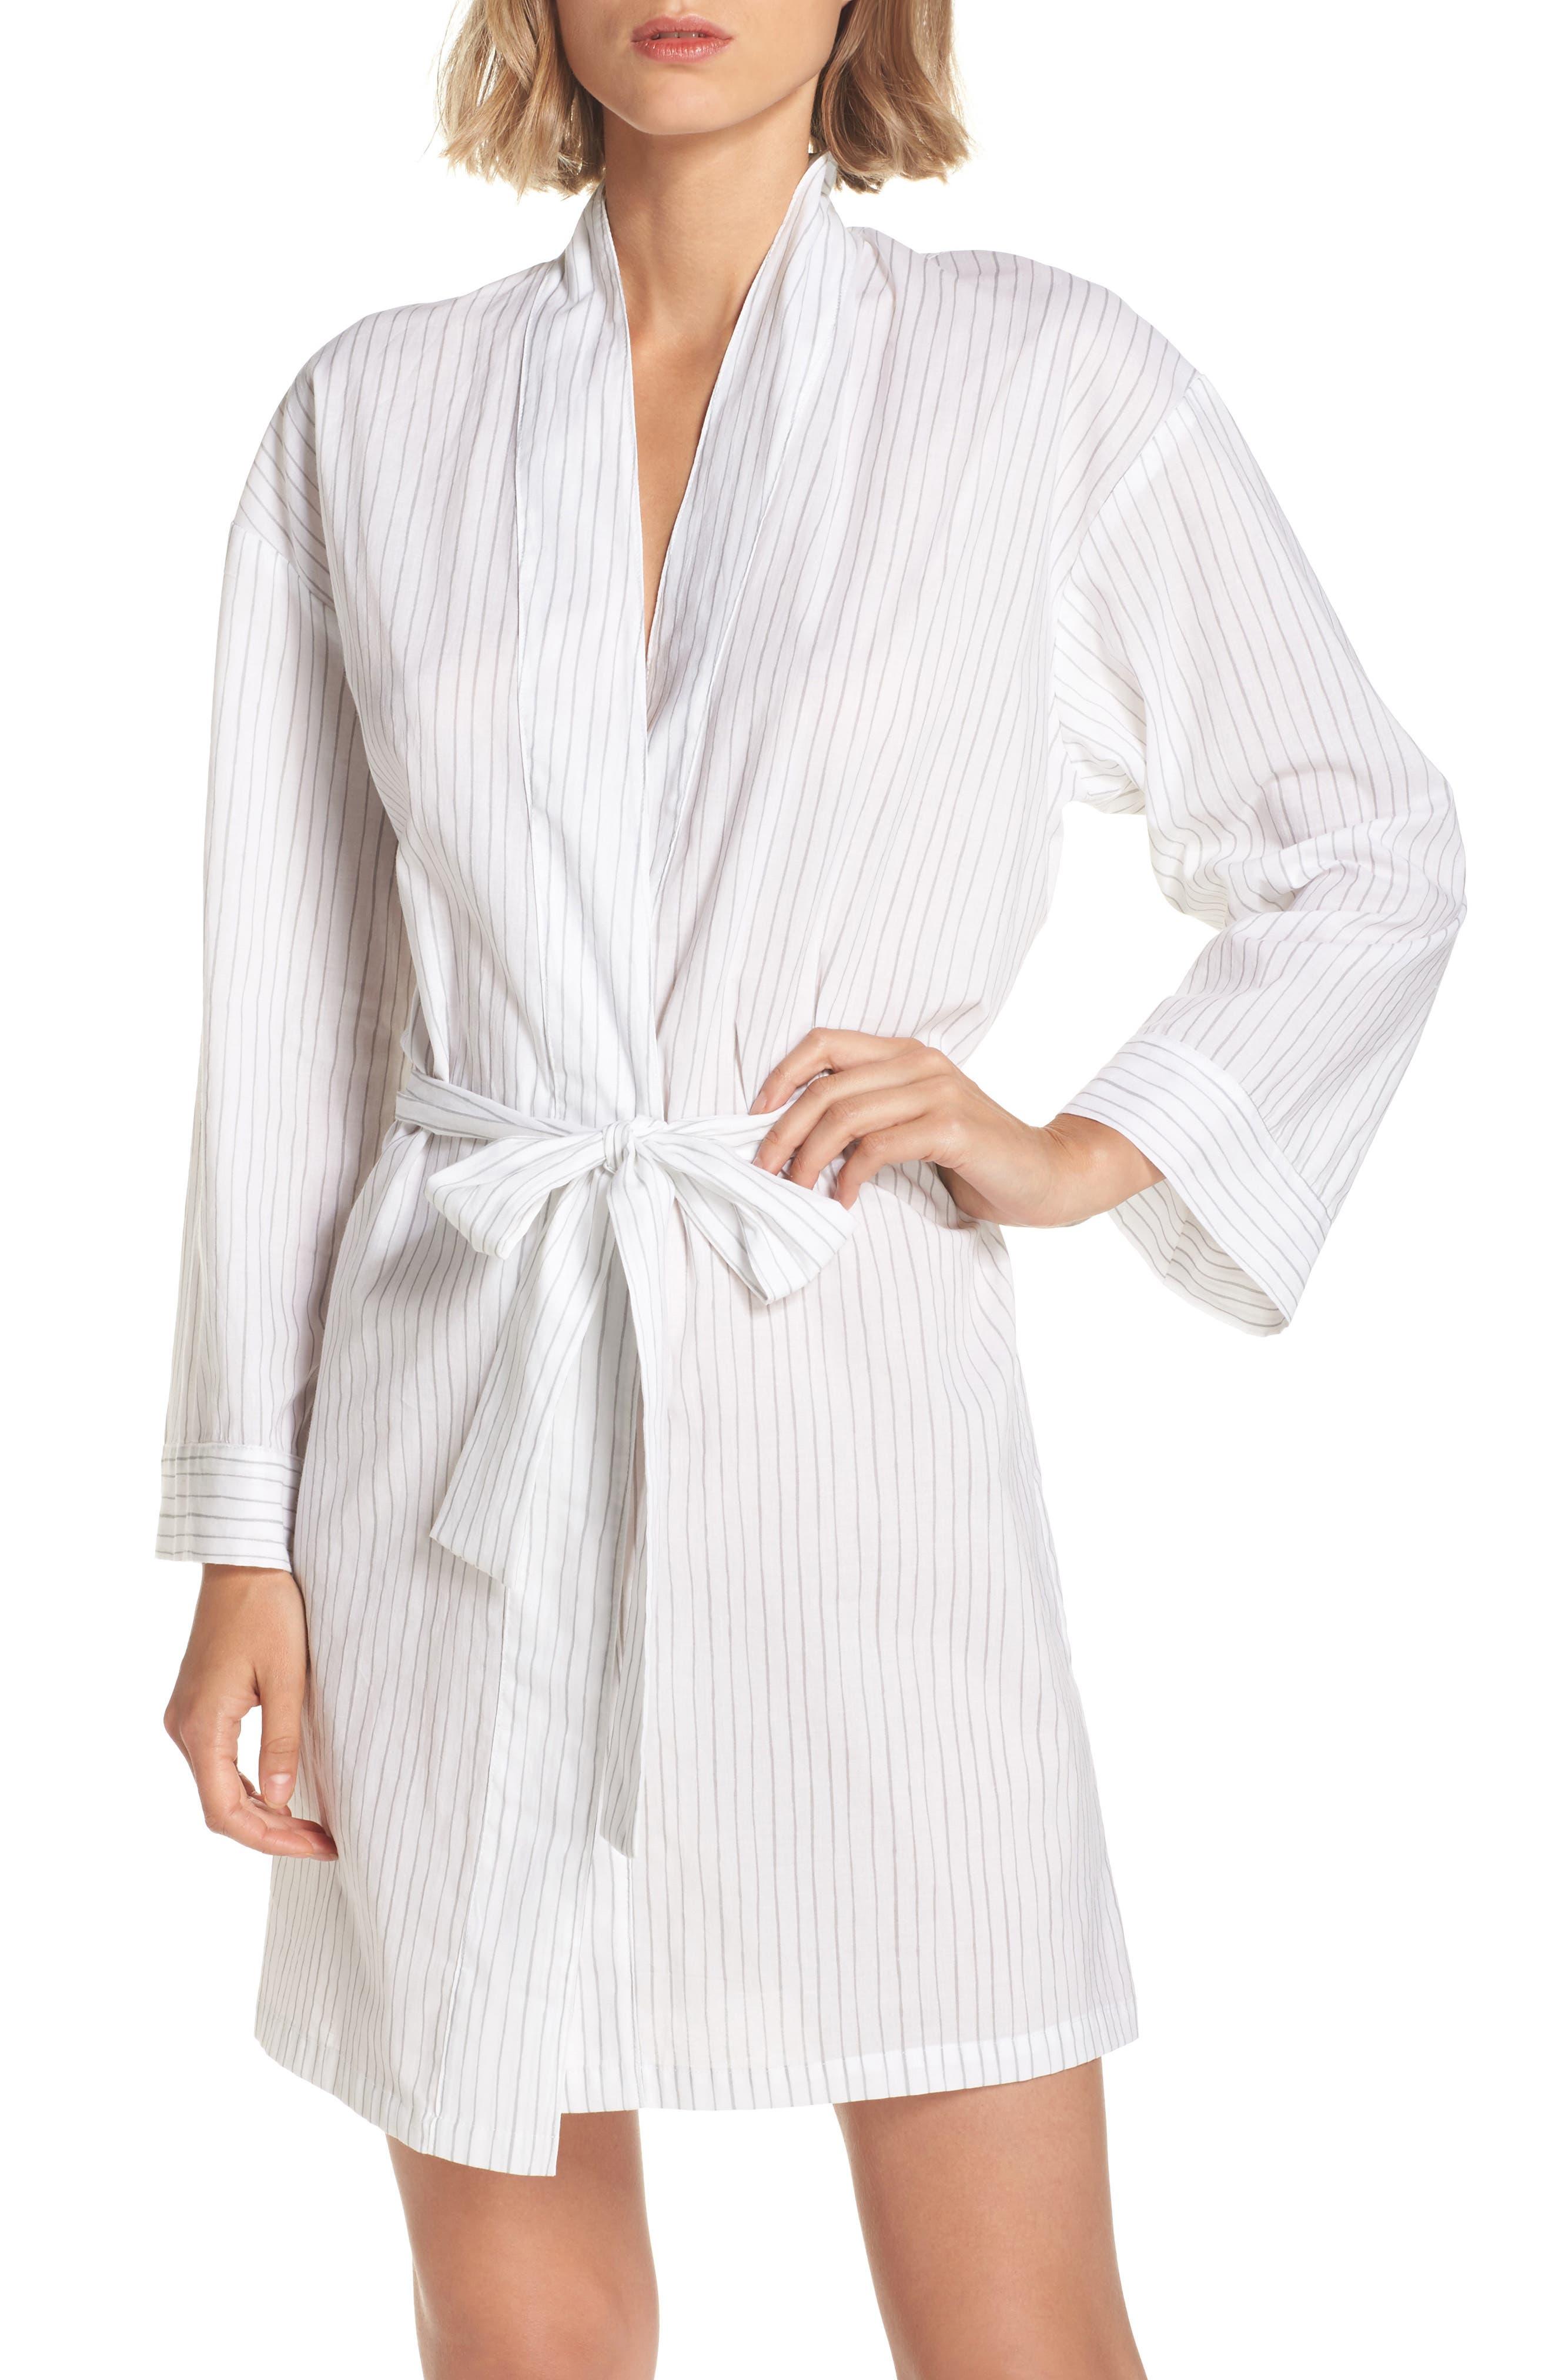 Alternate Image 1 Selected - Pour Les Femmes Pinstripe Robe